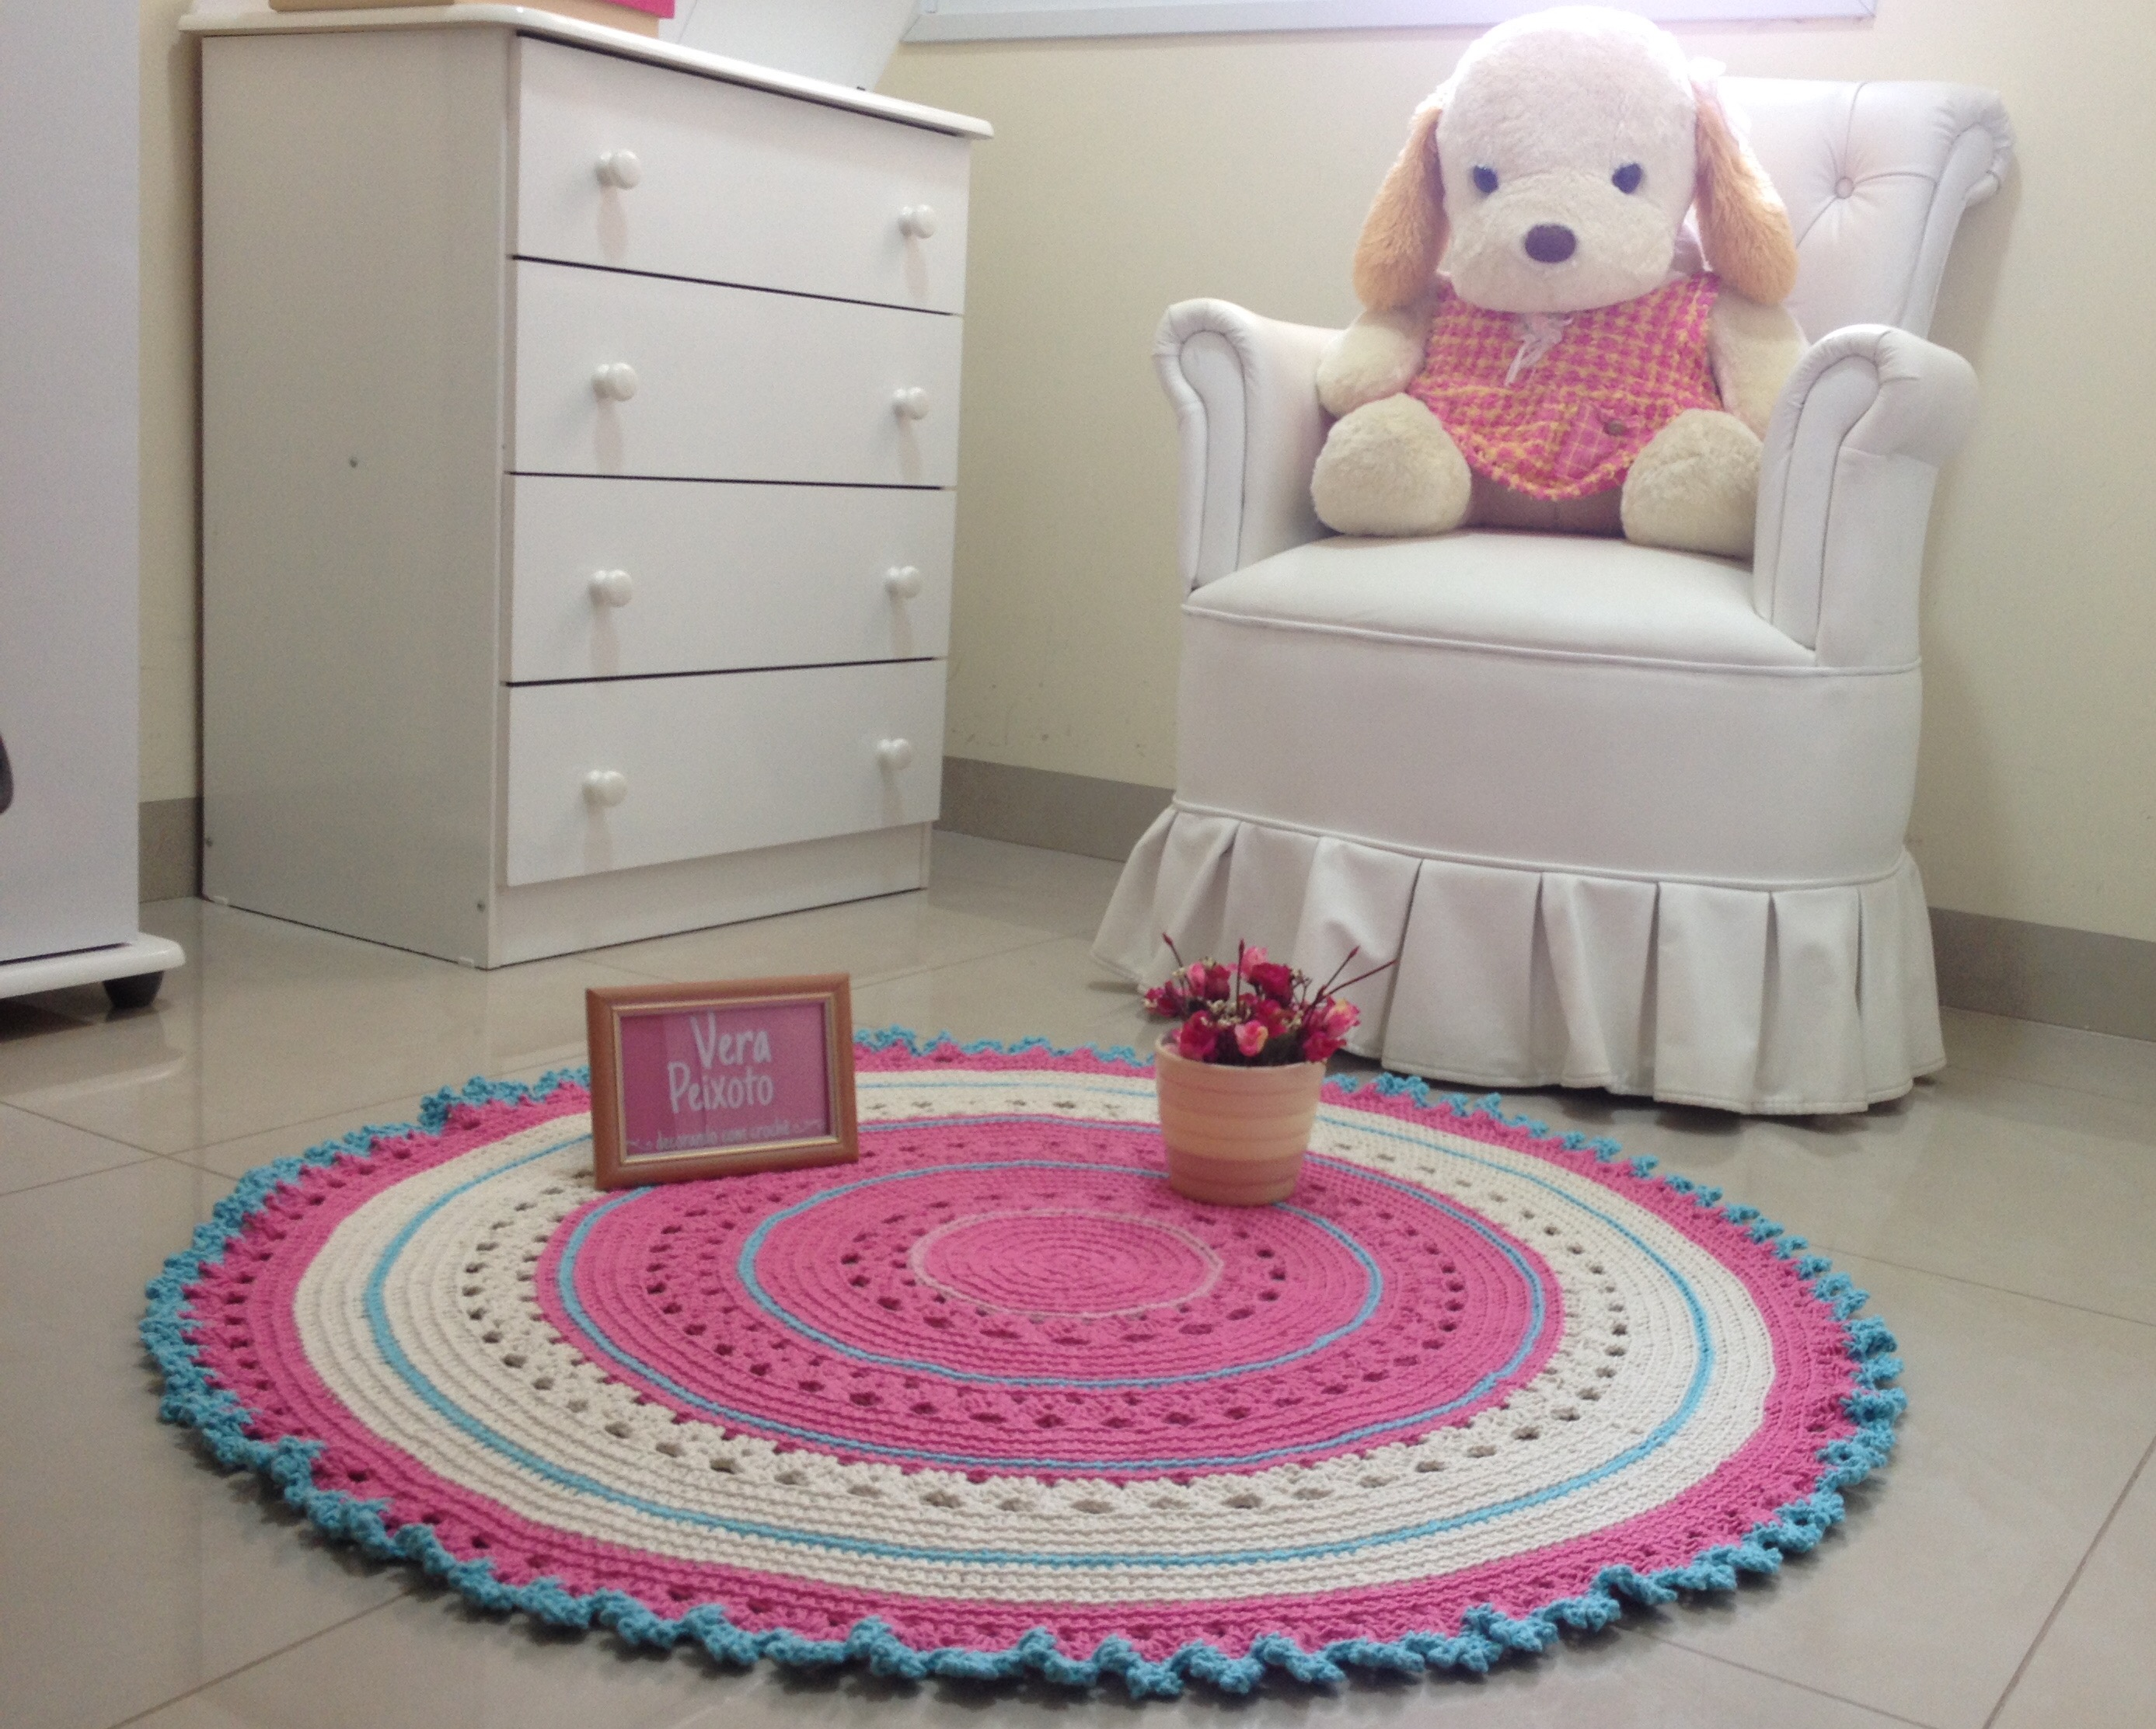 tapete rosa e azul baby maria fernanda ateli vera. Black Bedroom Furniture Sets. Home Design Ideas